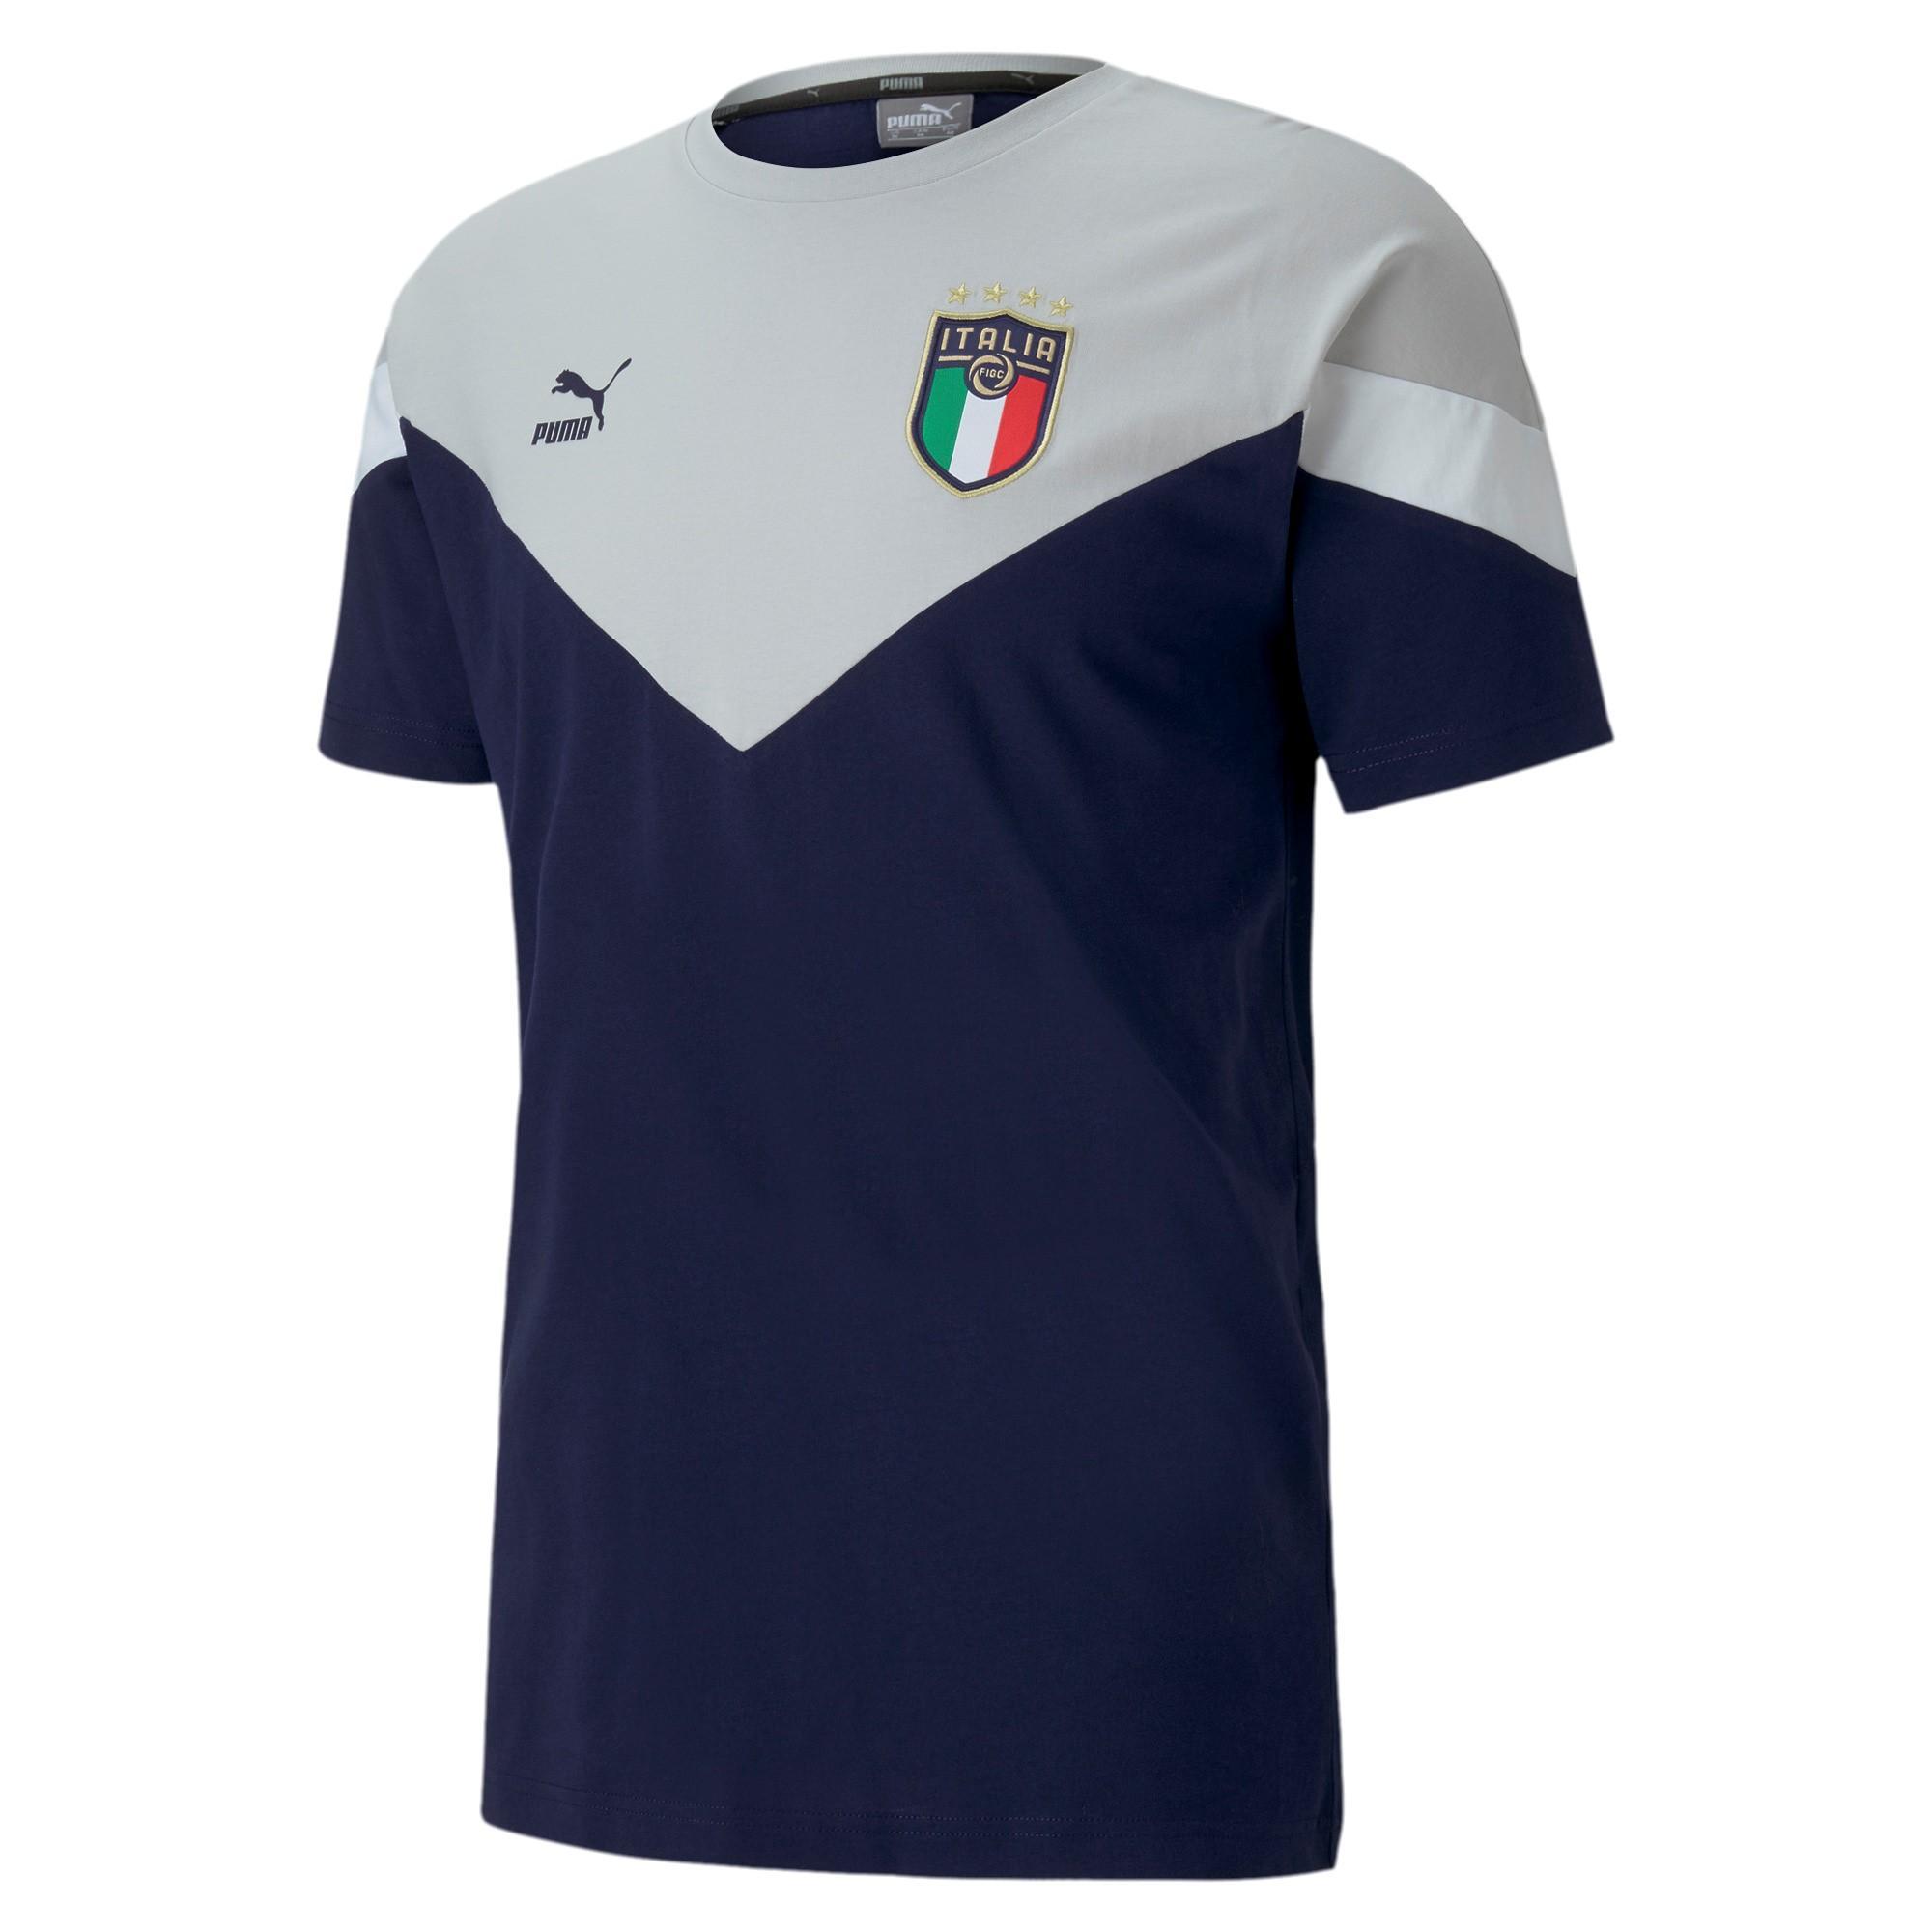 Puma T-shirt Iconic Mcs Italia